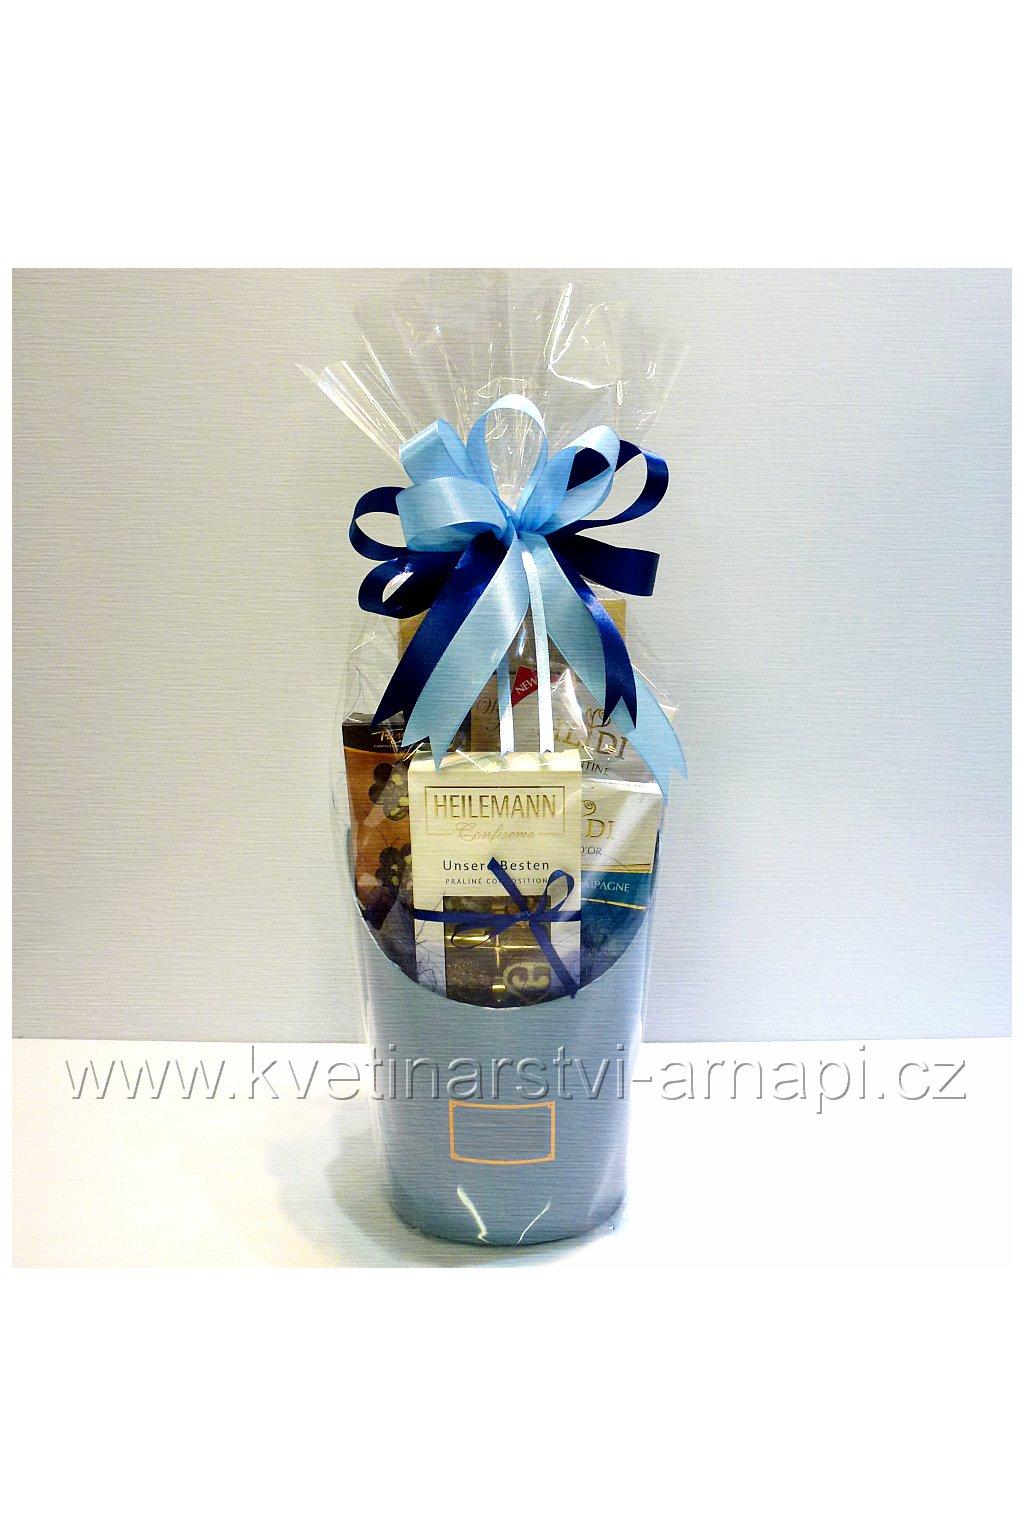 cokolady darkove balicky kose kytice kvetinarstvi arnapi